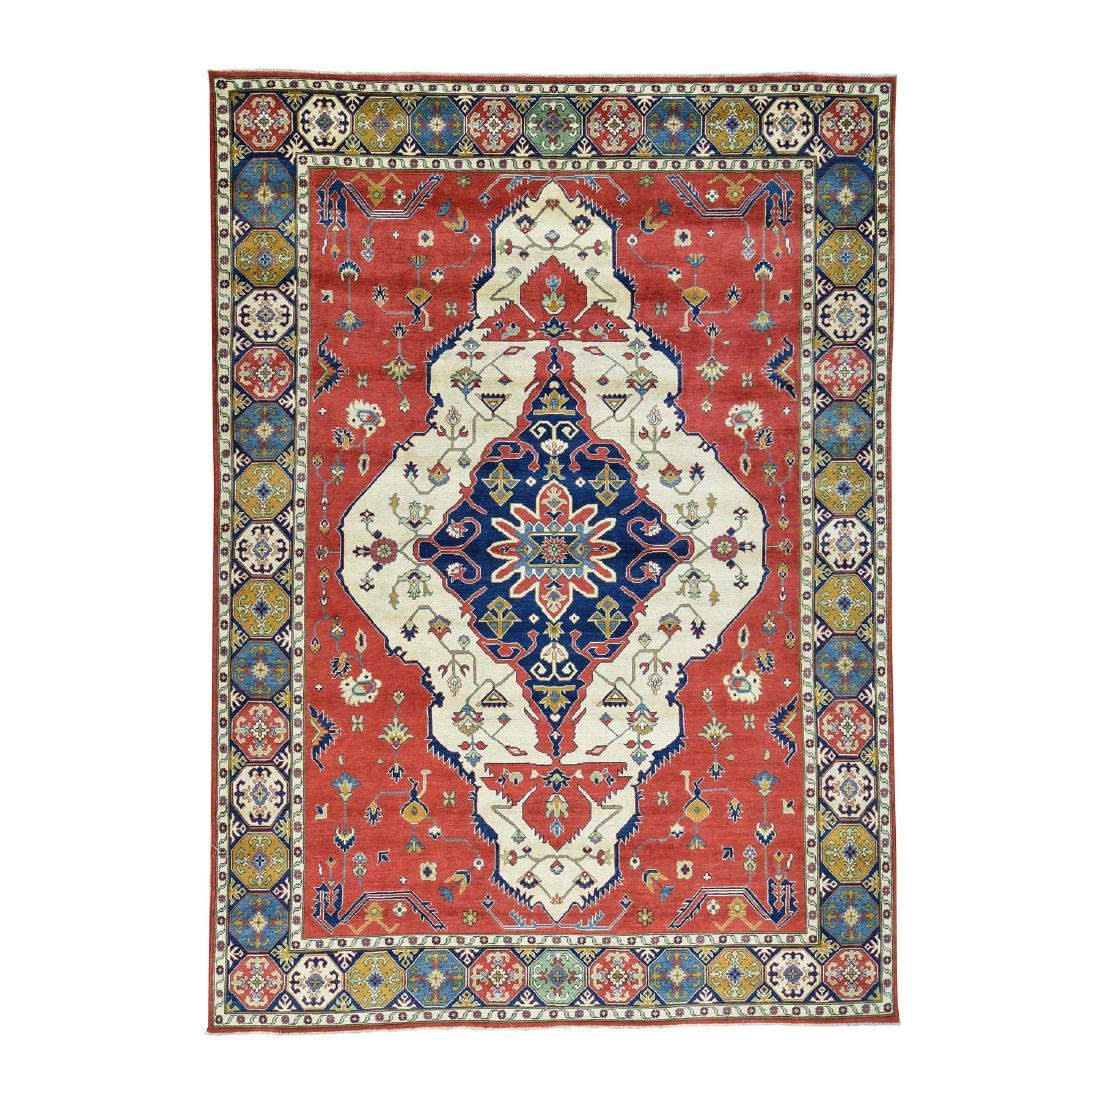 Hand-Knotted Kazak Medallion Design Wool Rug 9.10x13.7